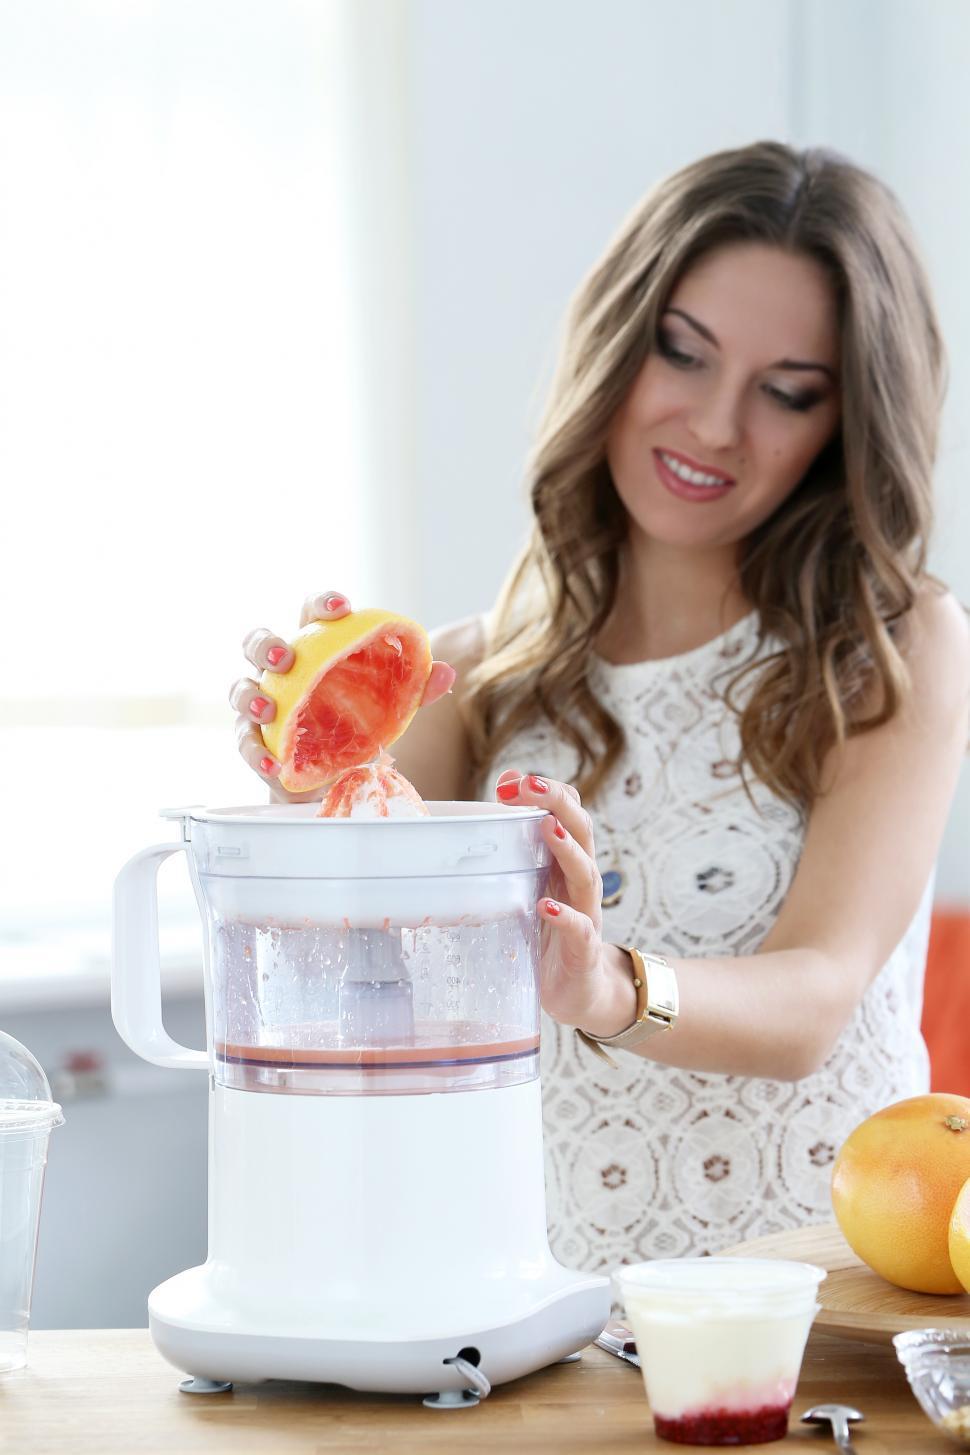 Download Free Stock HD Photo of Beautiful woman making orange juice Online